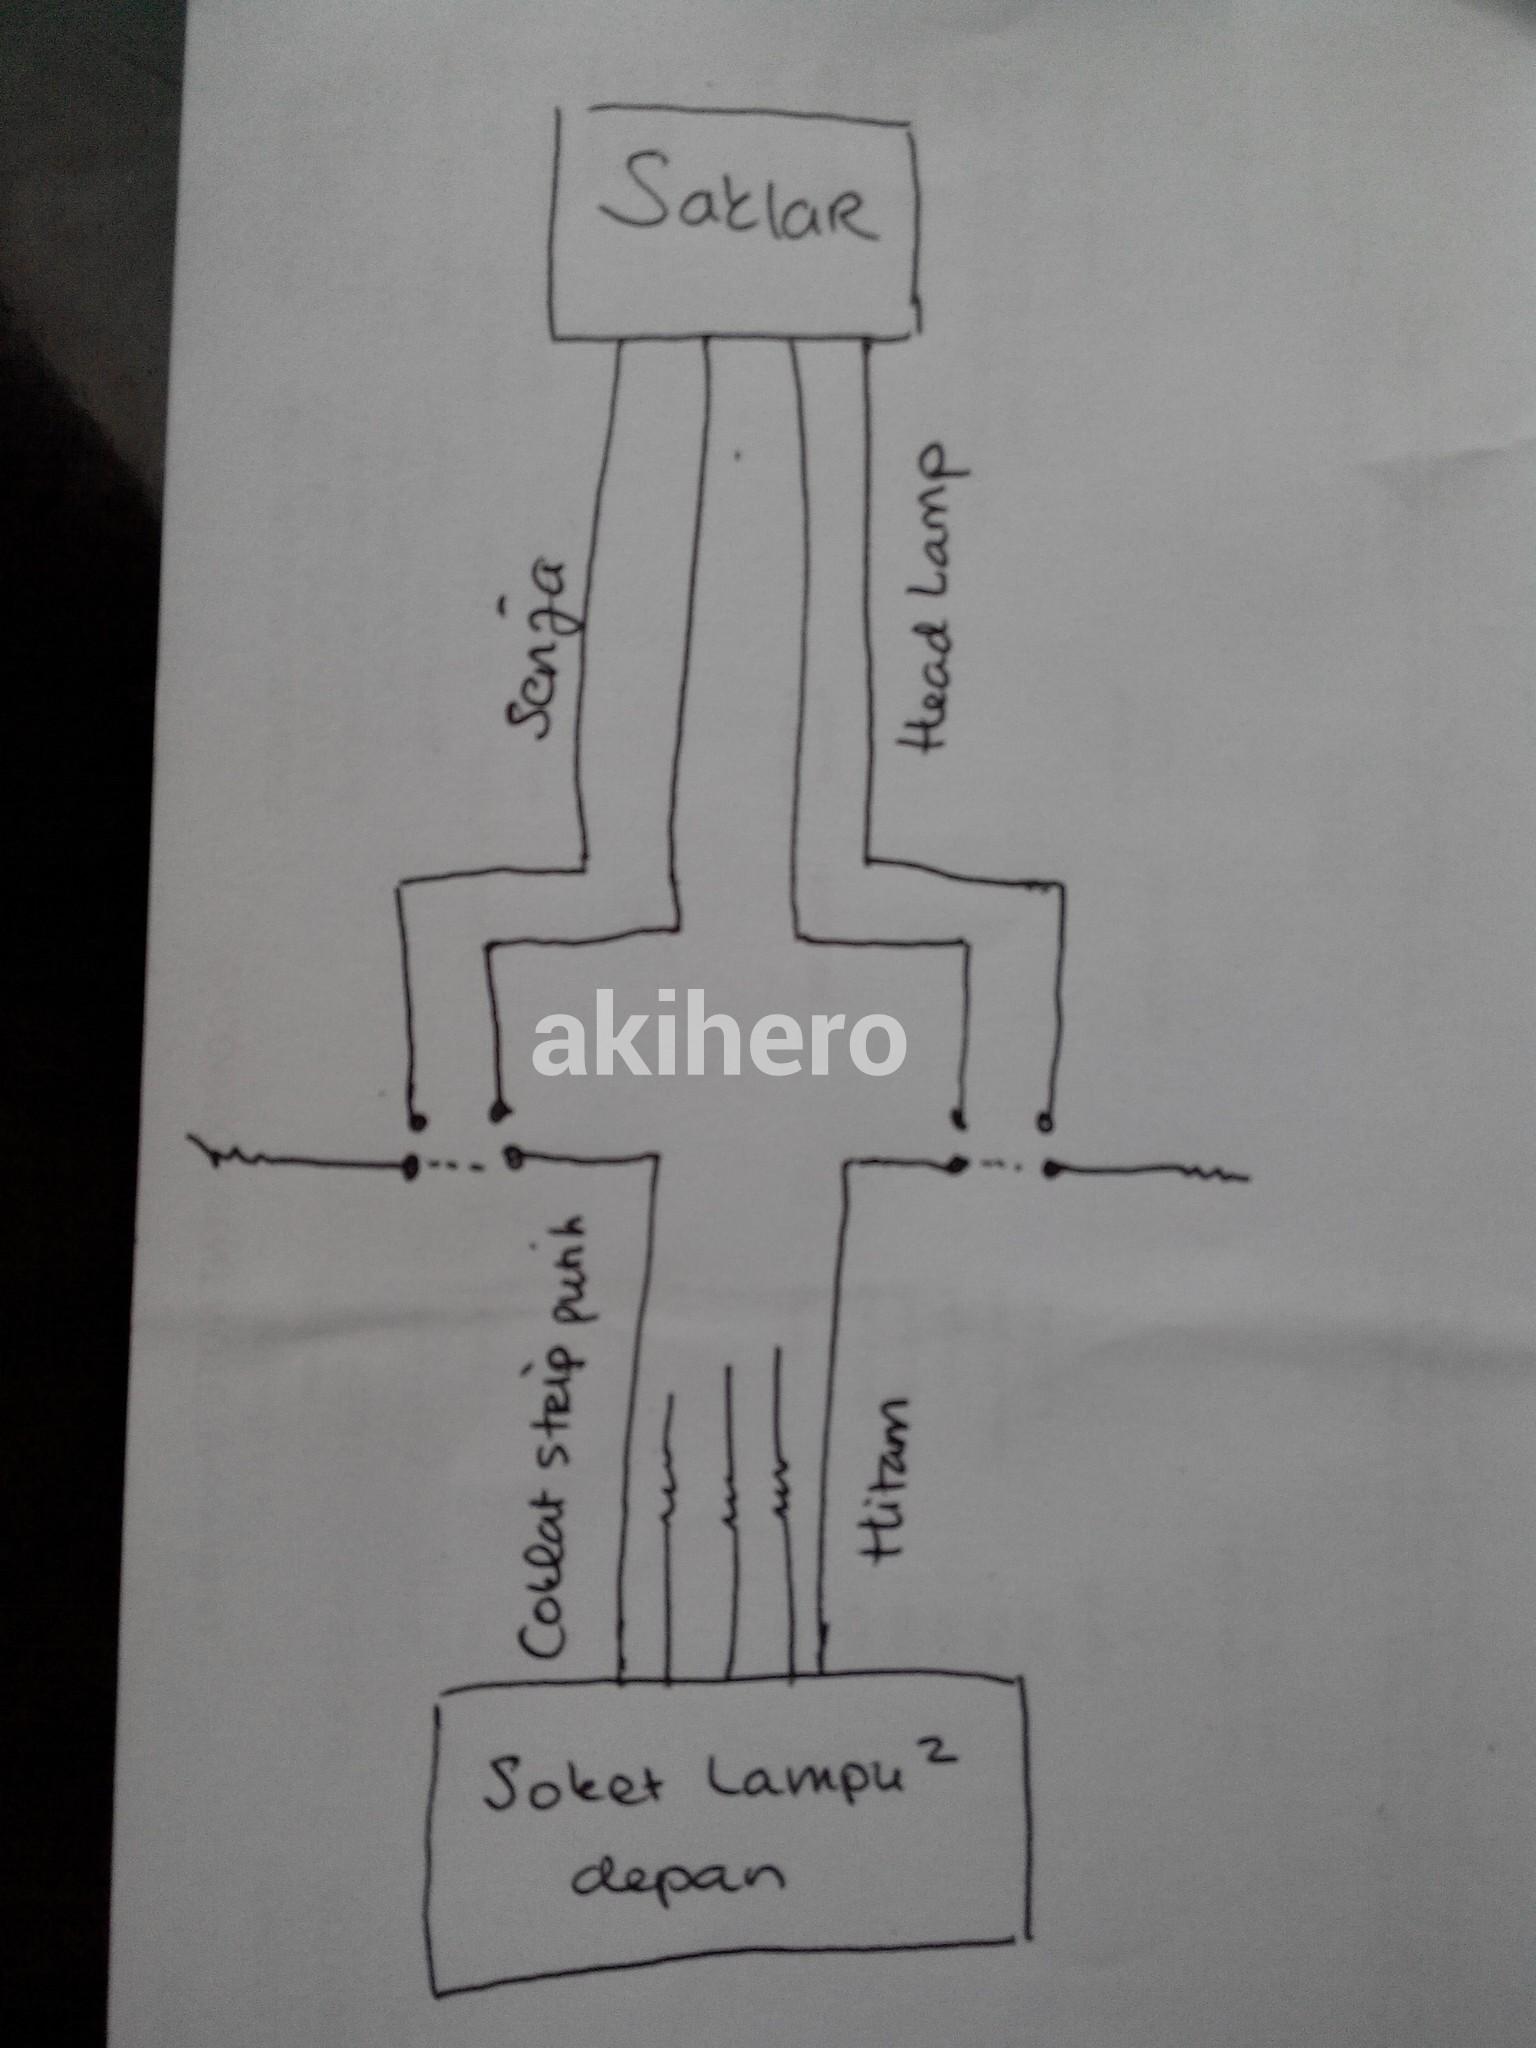 Pasang saklar headlamp new vario 125150 akihero image asfbconference2016 Image collections